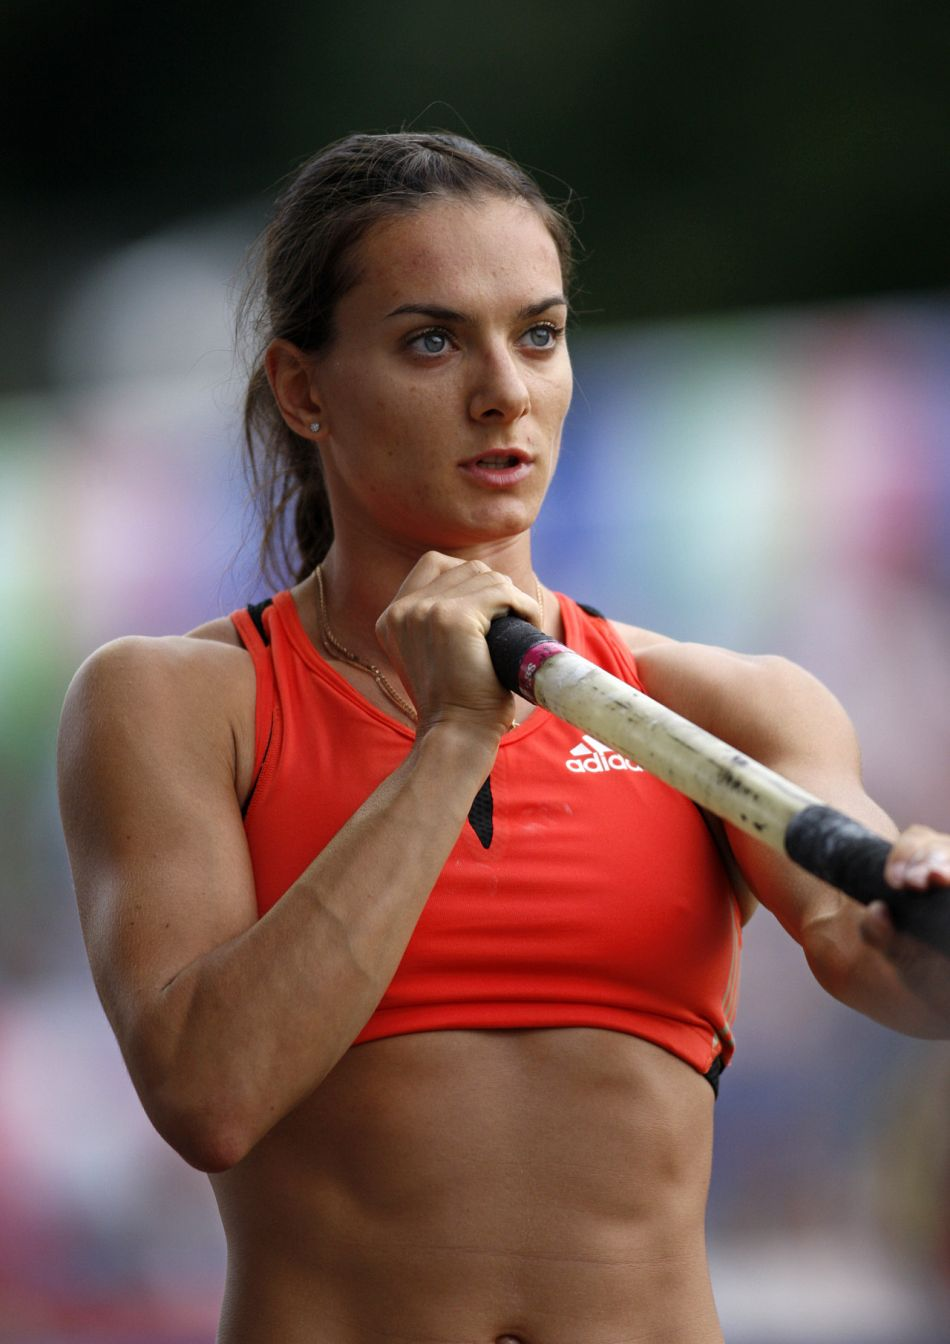 Youtube Russian Woman Pole Vaulter 43